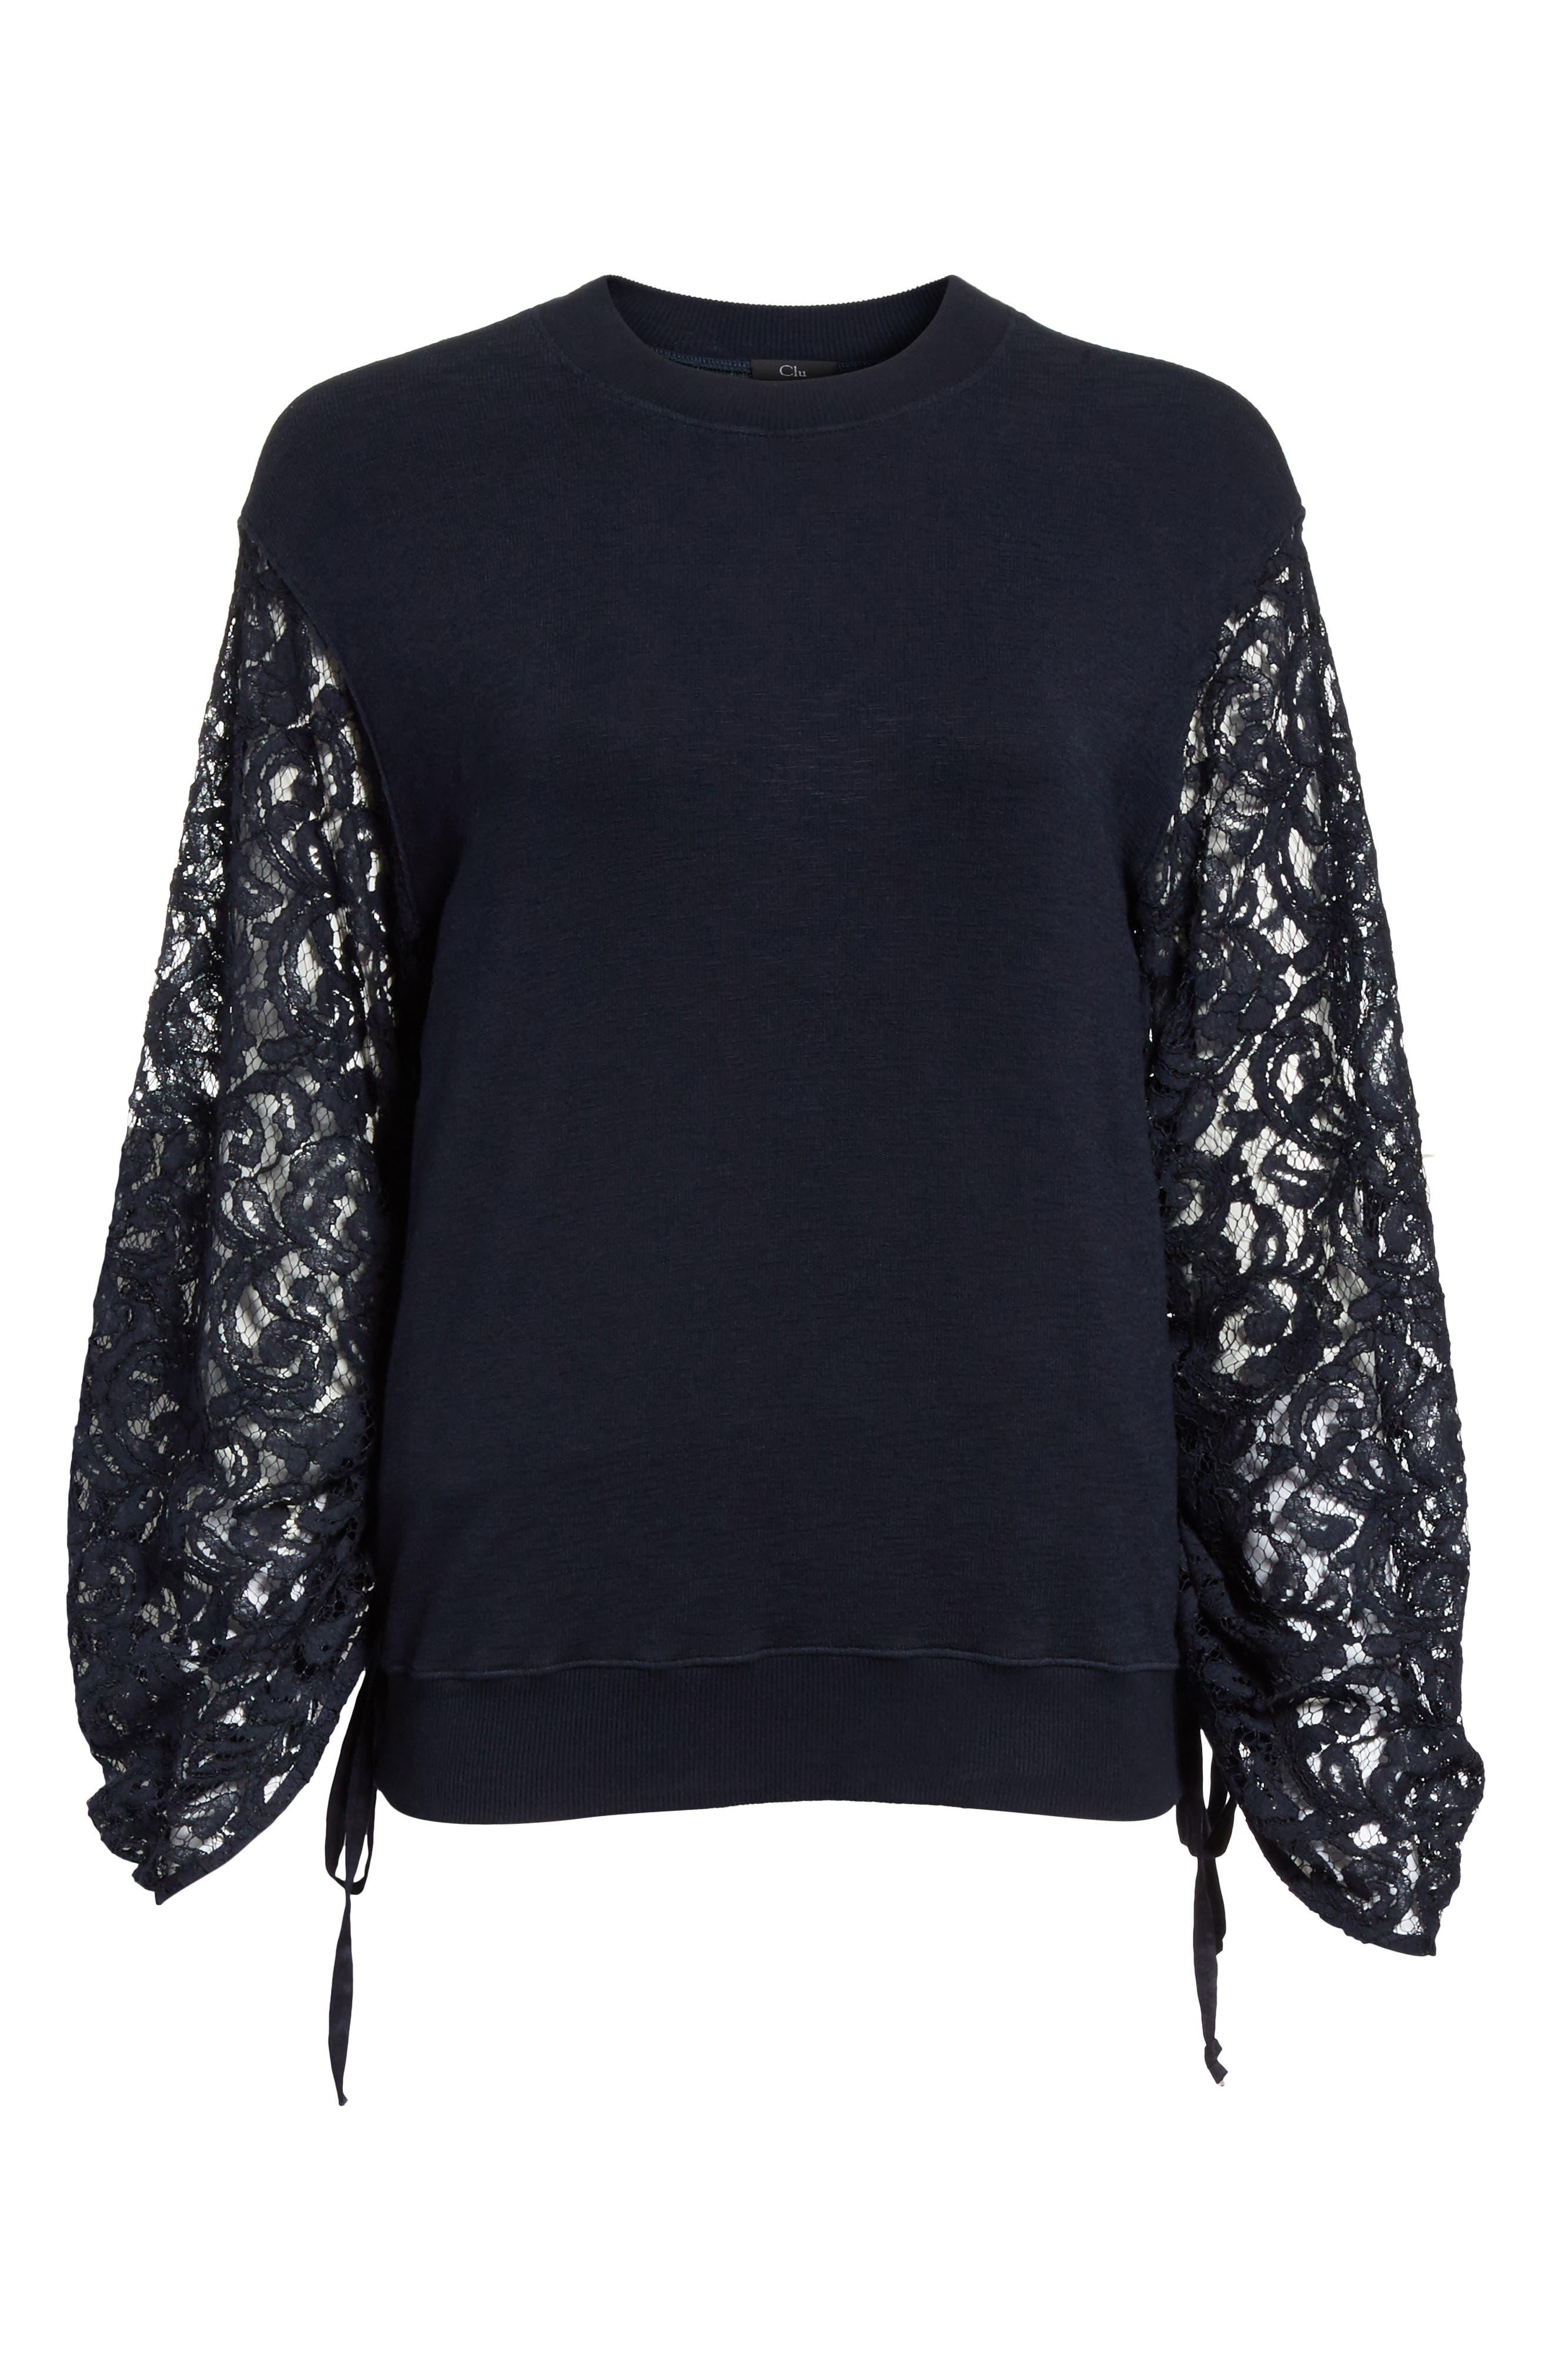 CLU,                             Lace Sleeve Sweatshirt,                             Alternate thumbnail 6, color,                             491